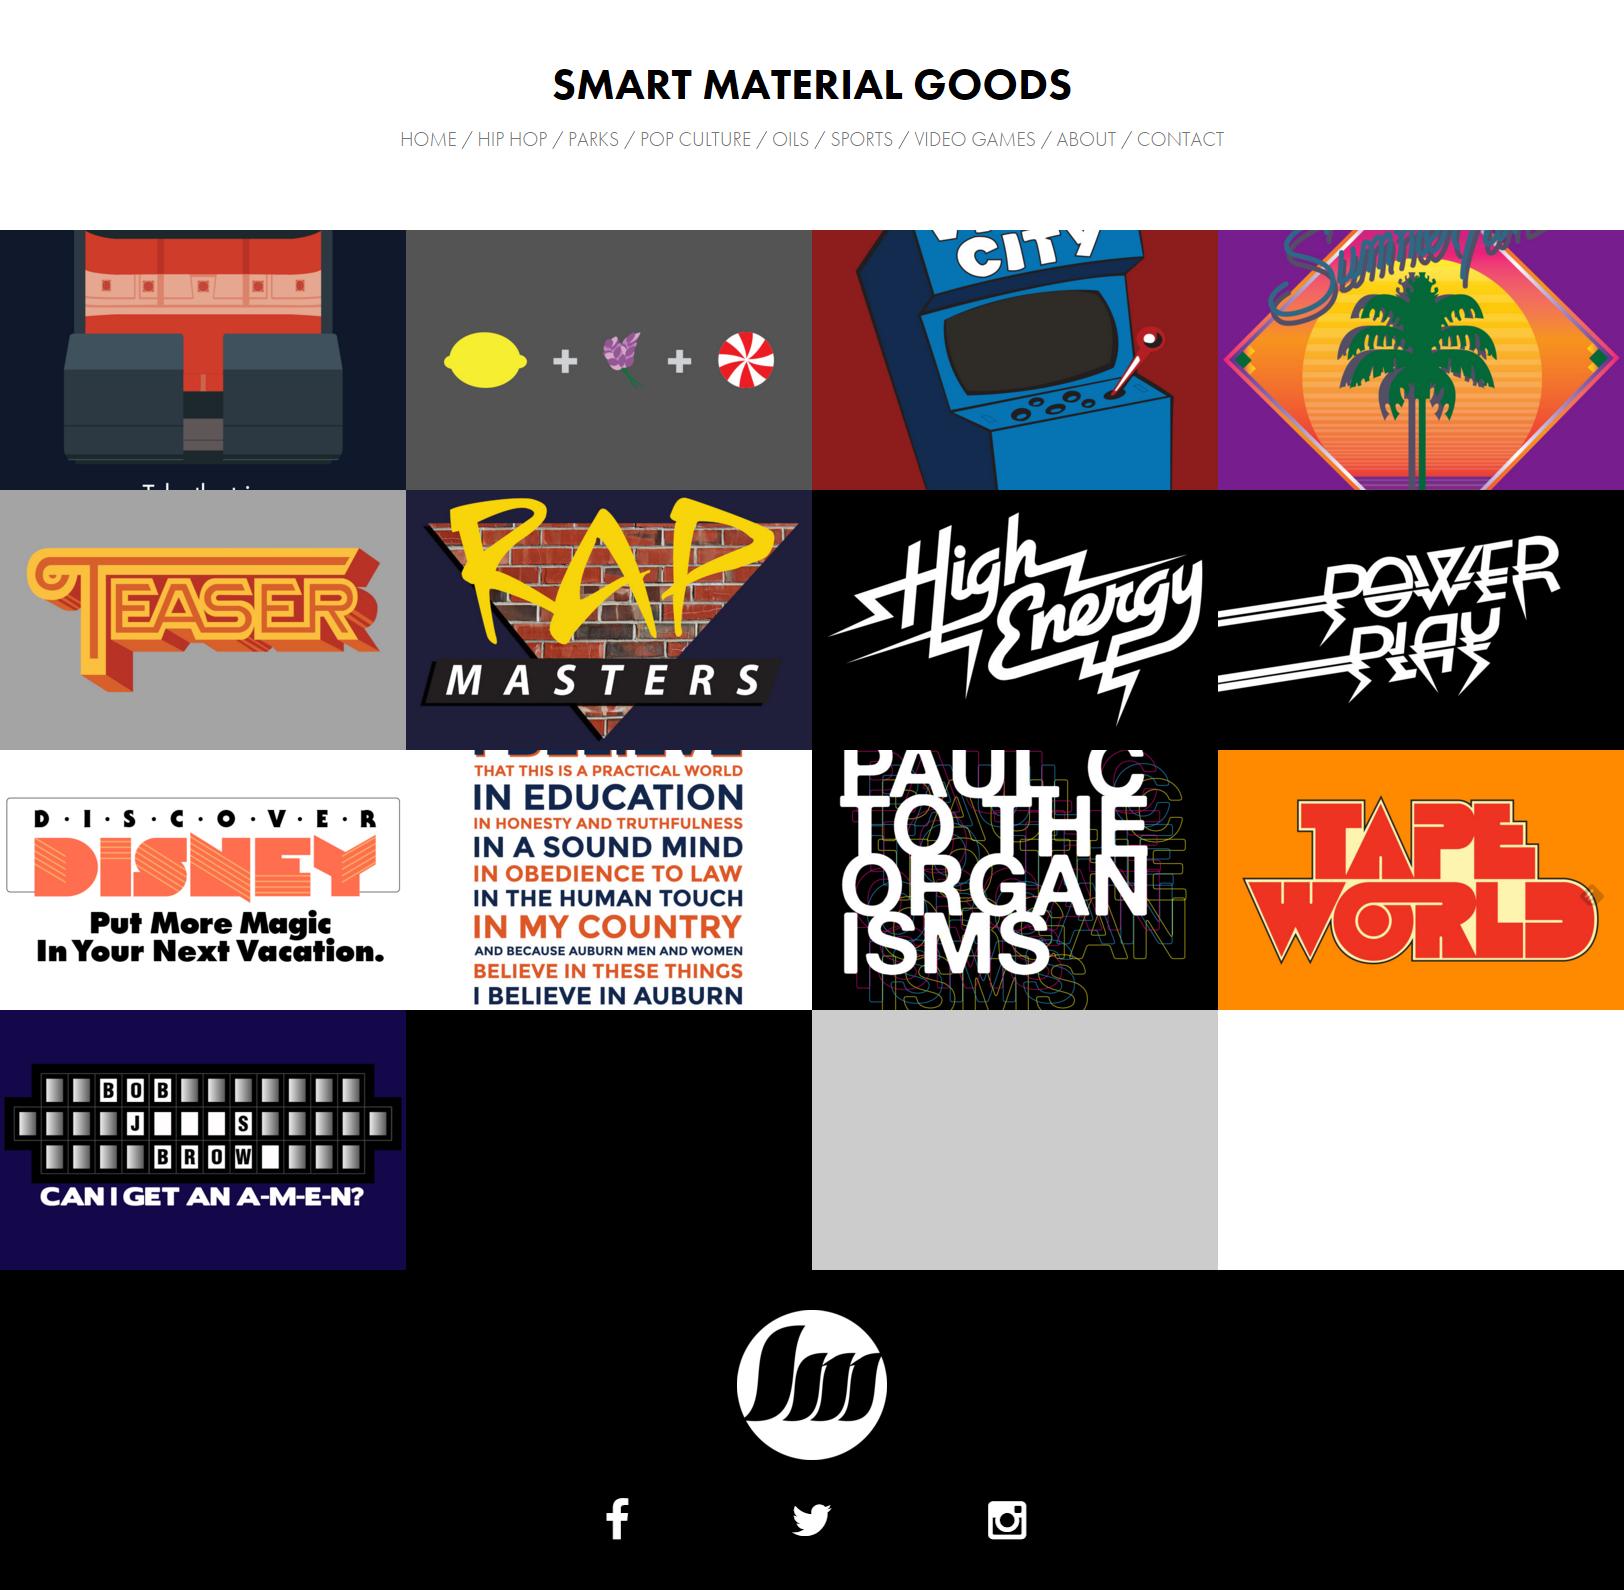 Smart Material Goods website